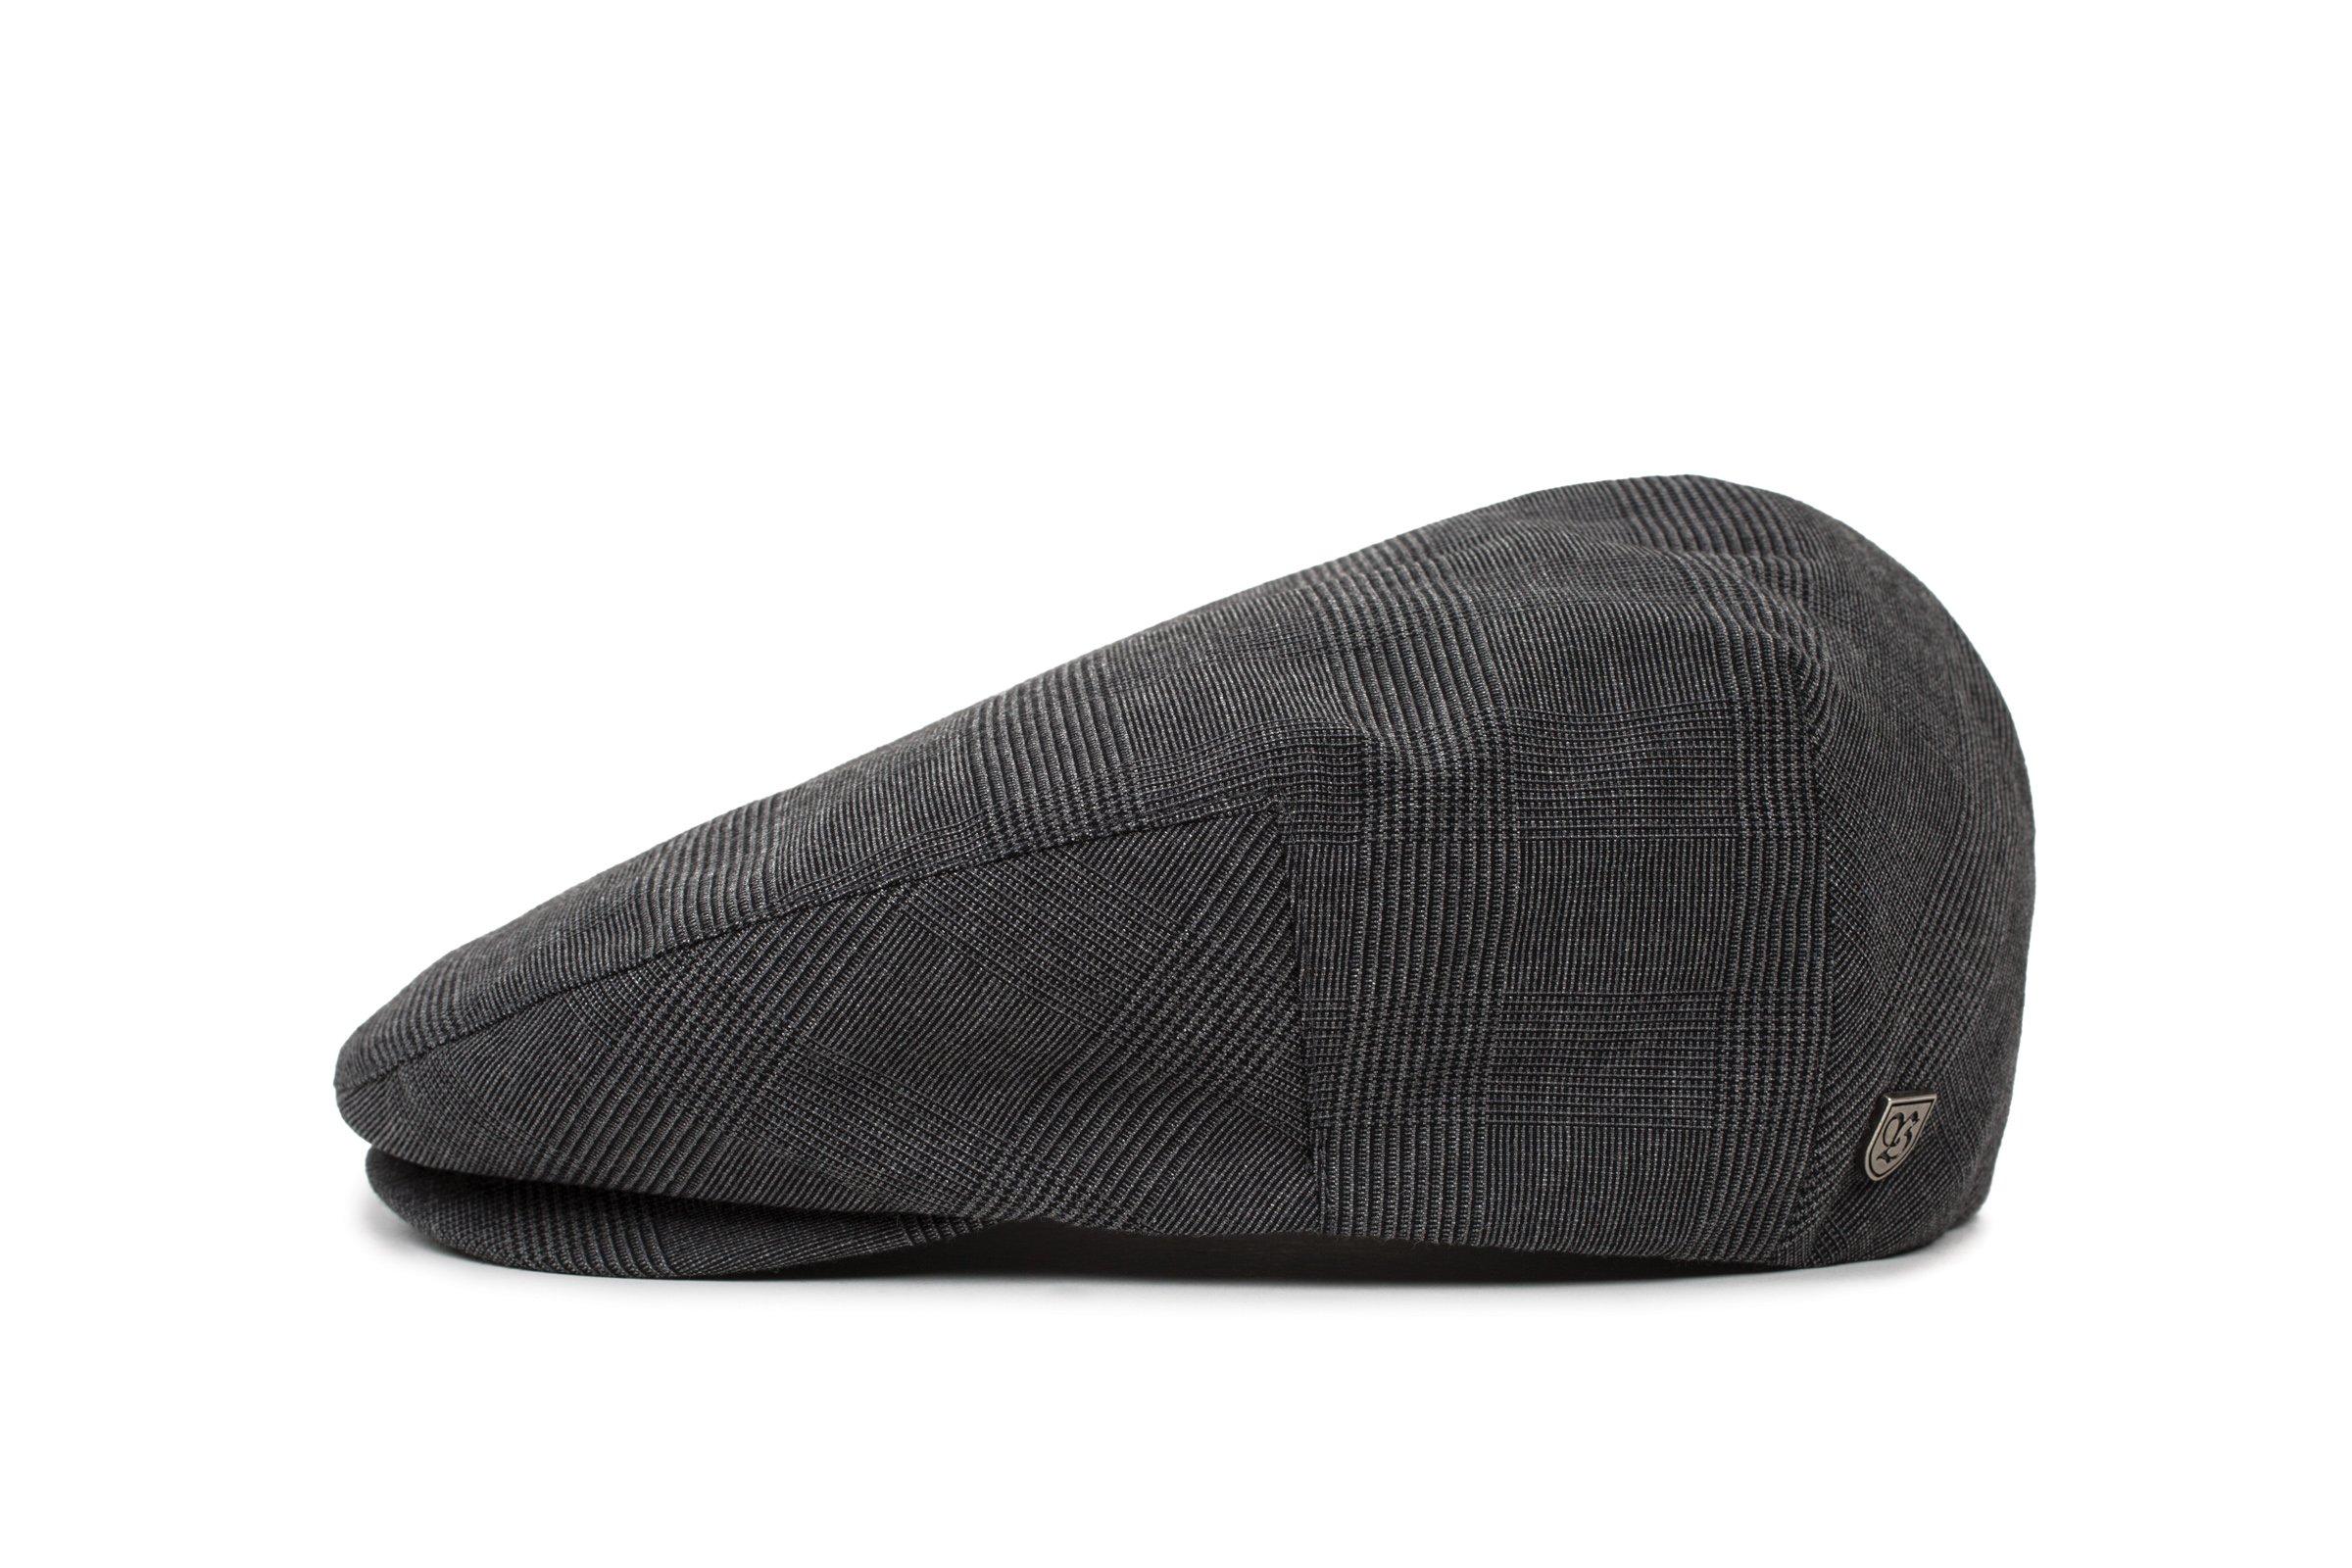 a3da296c Galleon - Brixton Men's Hooligan Driver SNAP HAT, Black/Dark Grey S